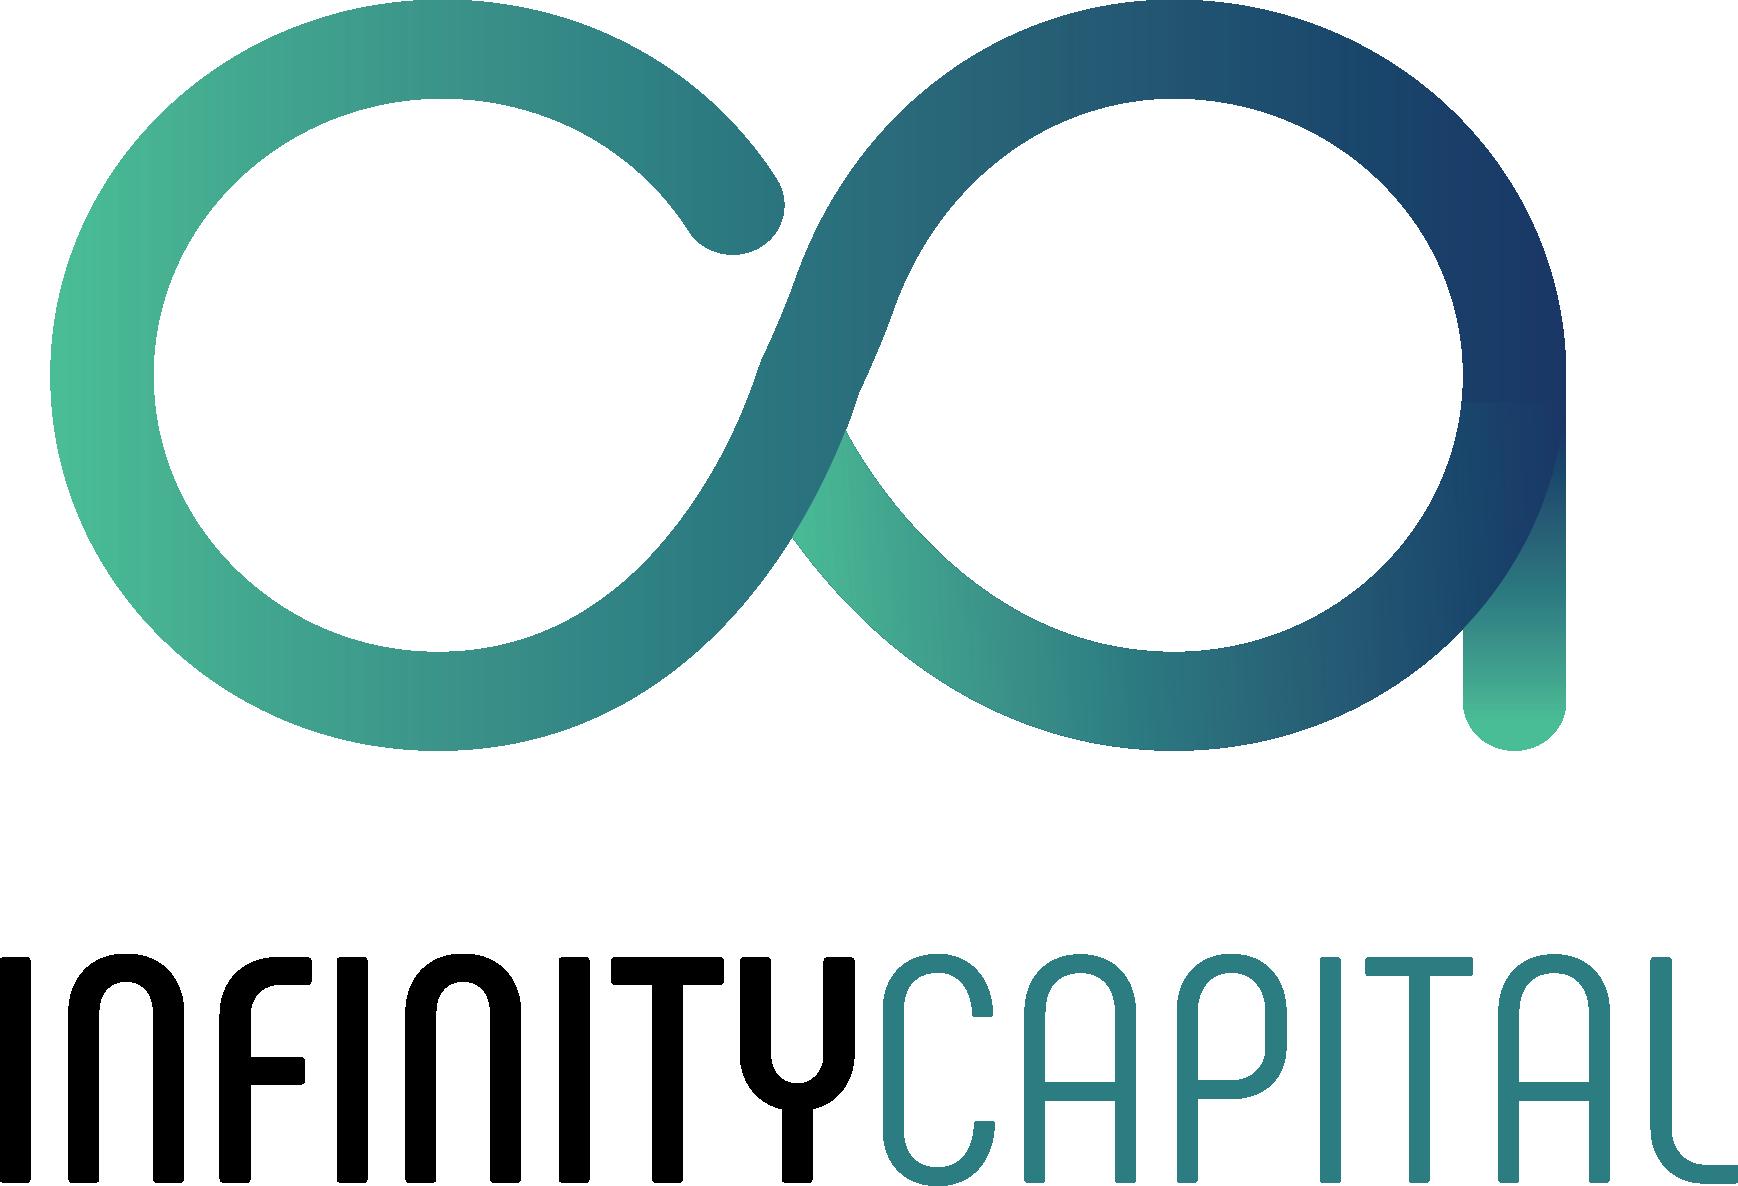 Infinity Capital 2020